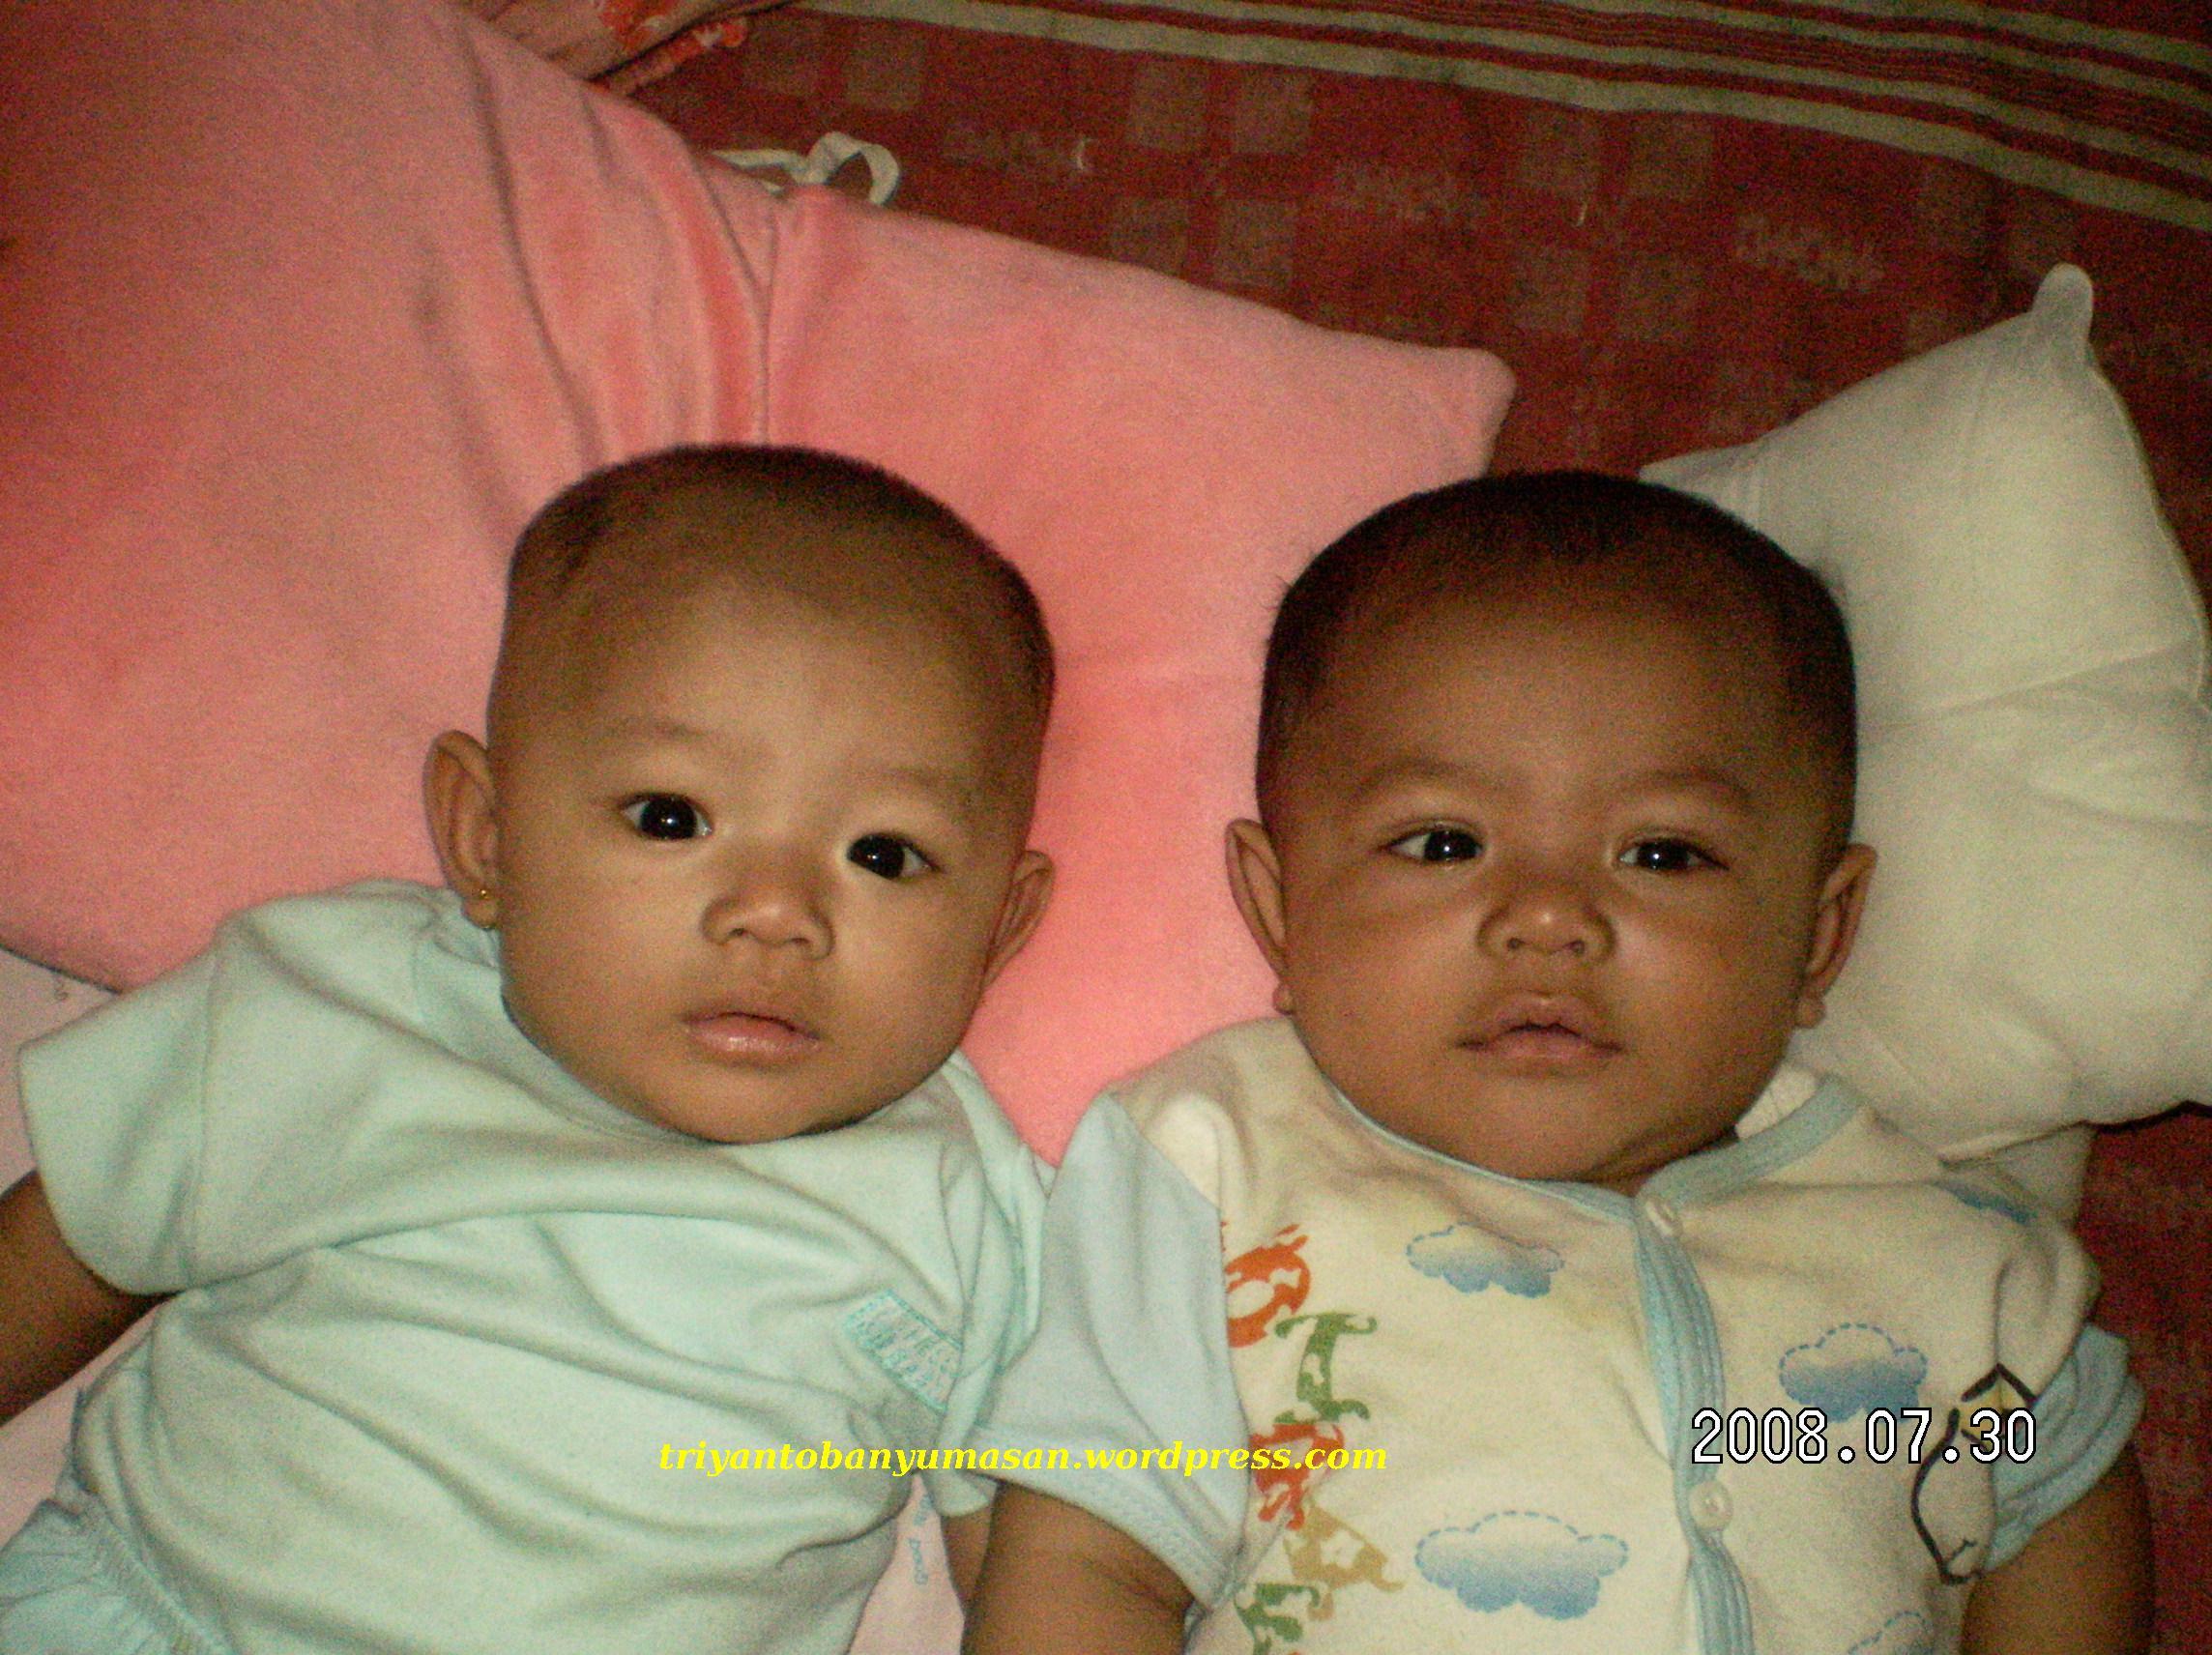 Anak Kembar Haruskah Kembar Triyanto Banyumasan Blogs